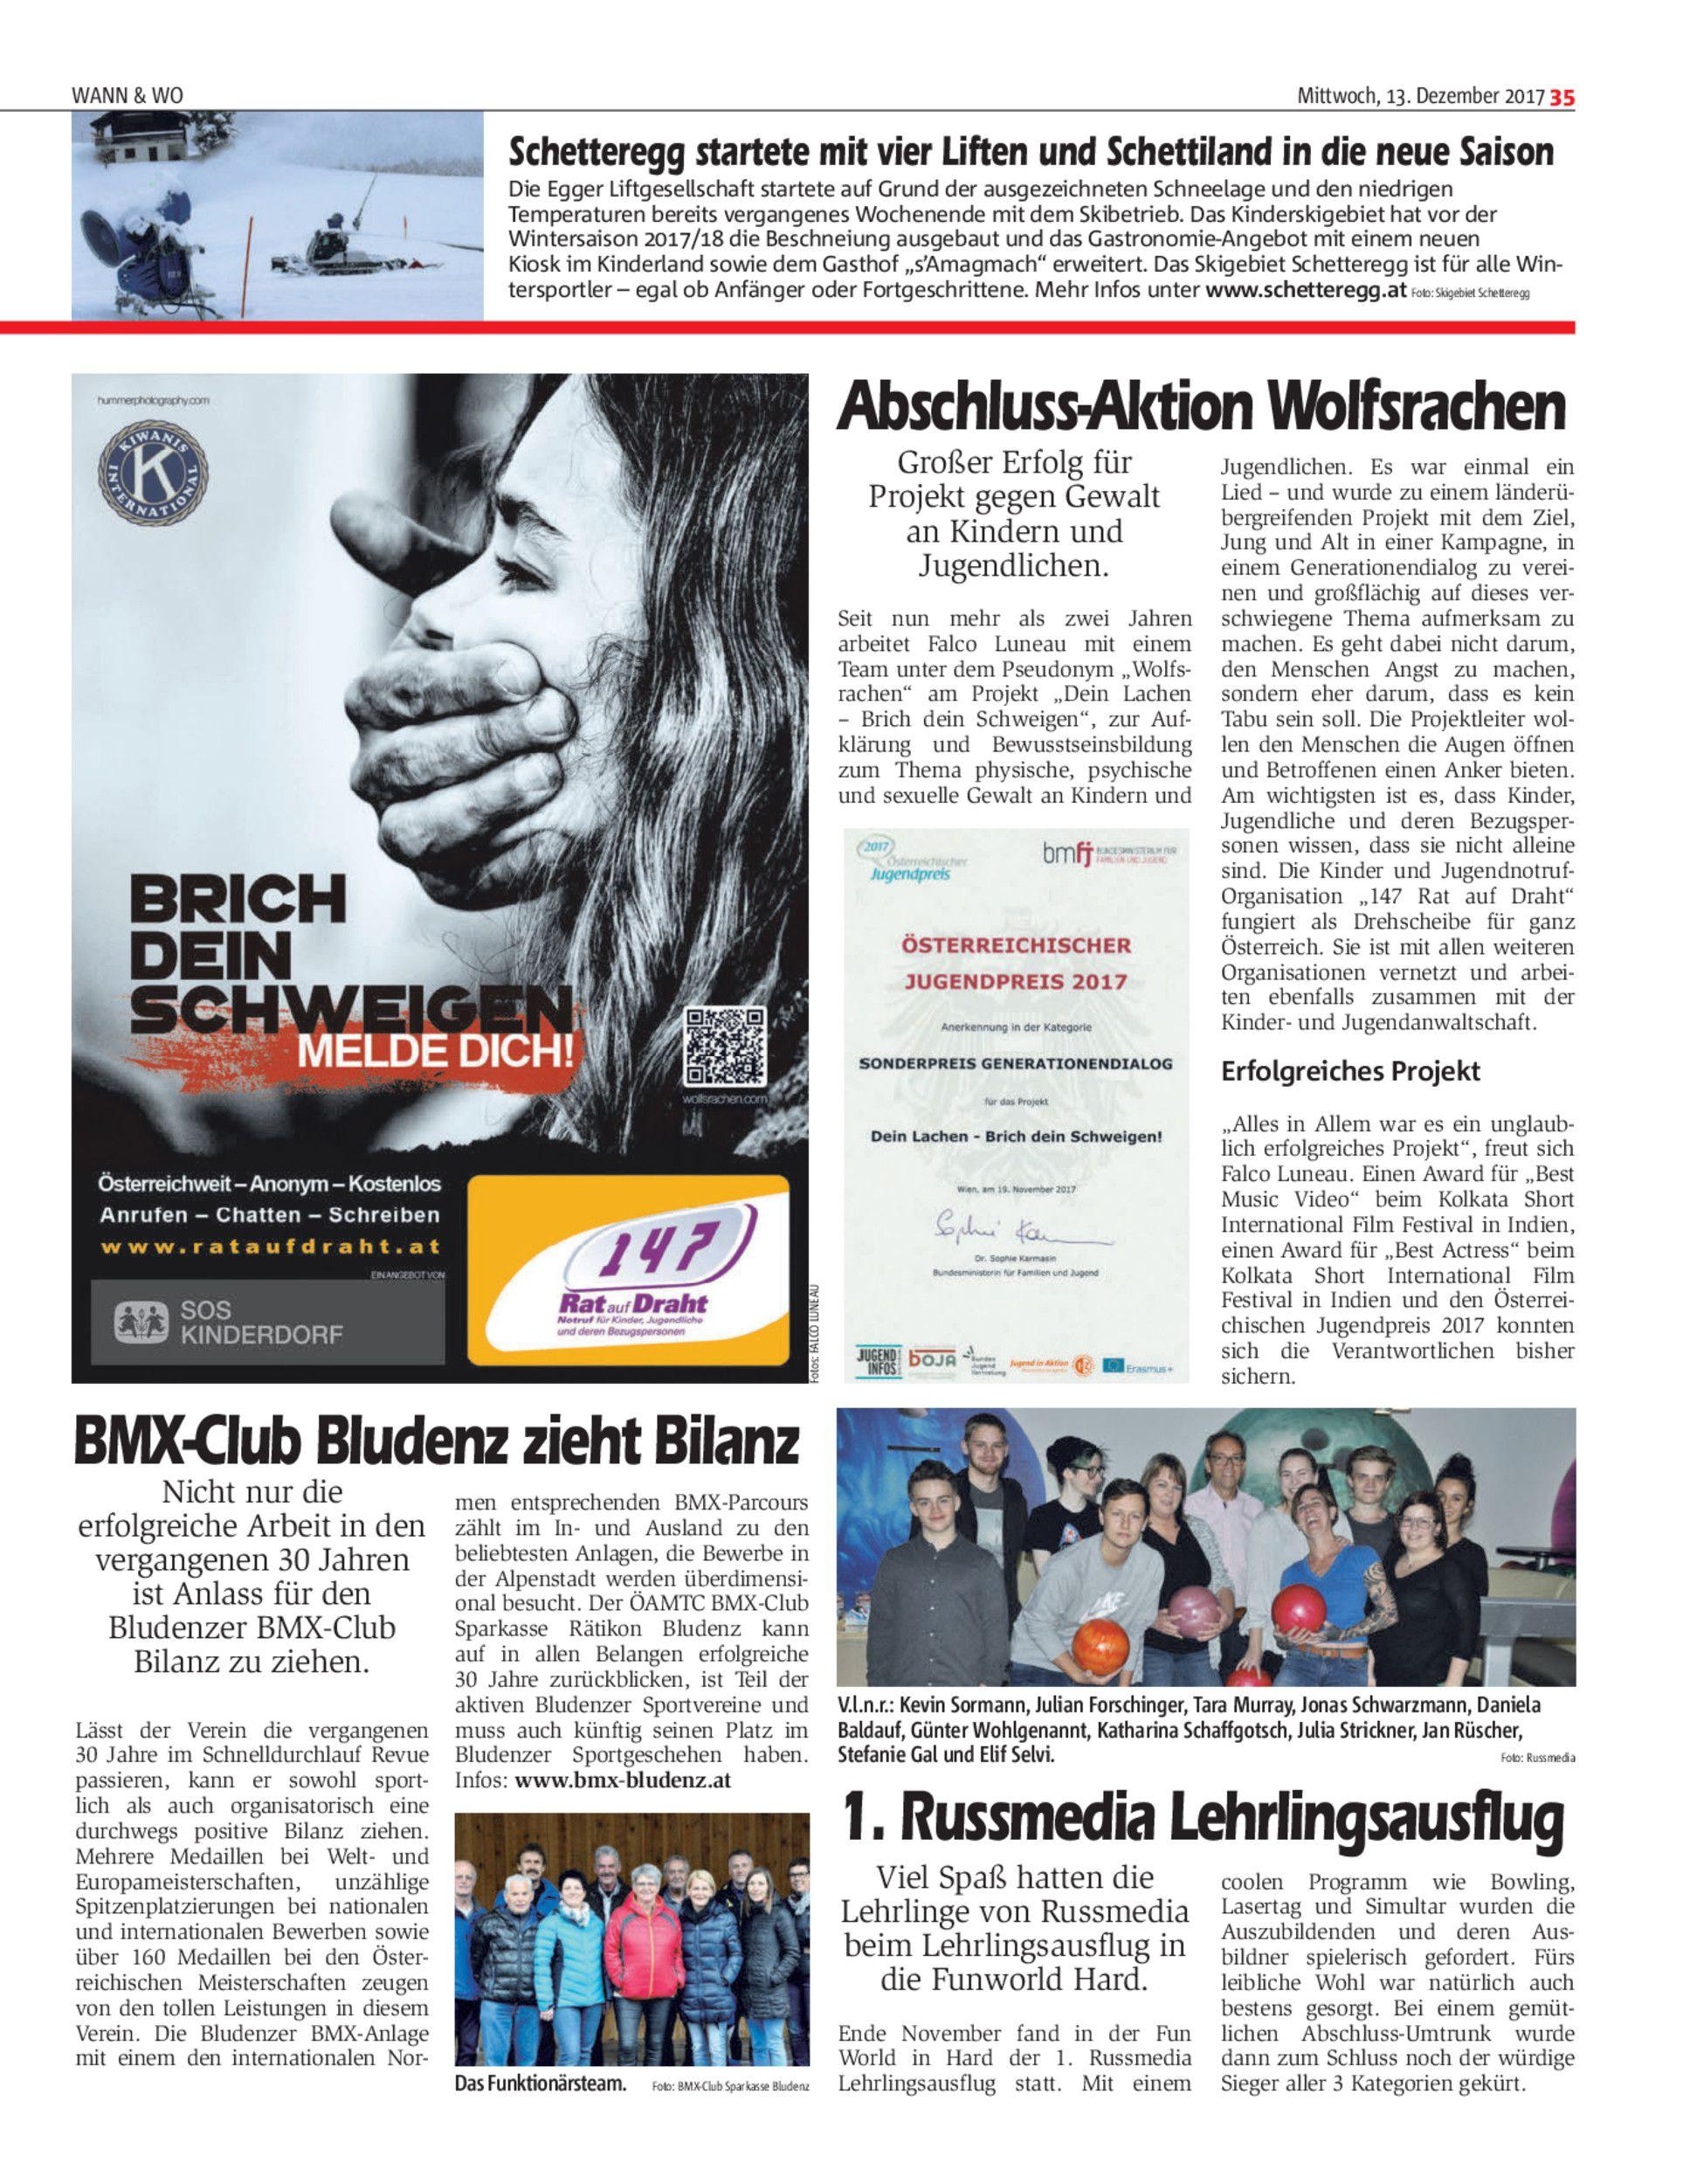 Wunderbar El Draht Batterielampen Galerie - Der Schaltplan - greigo.com